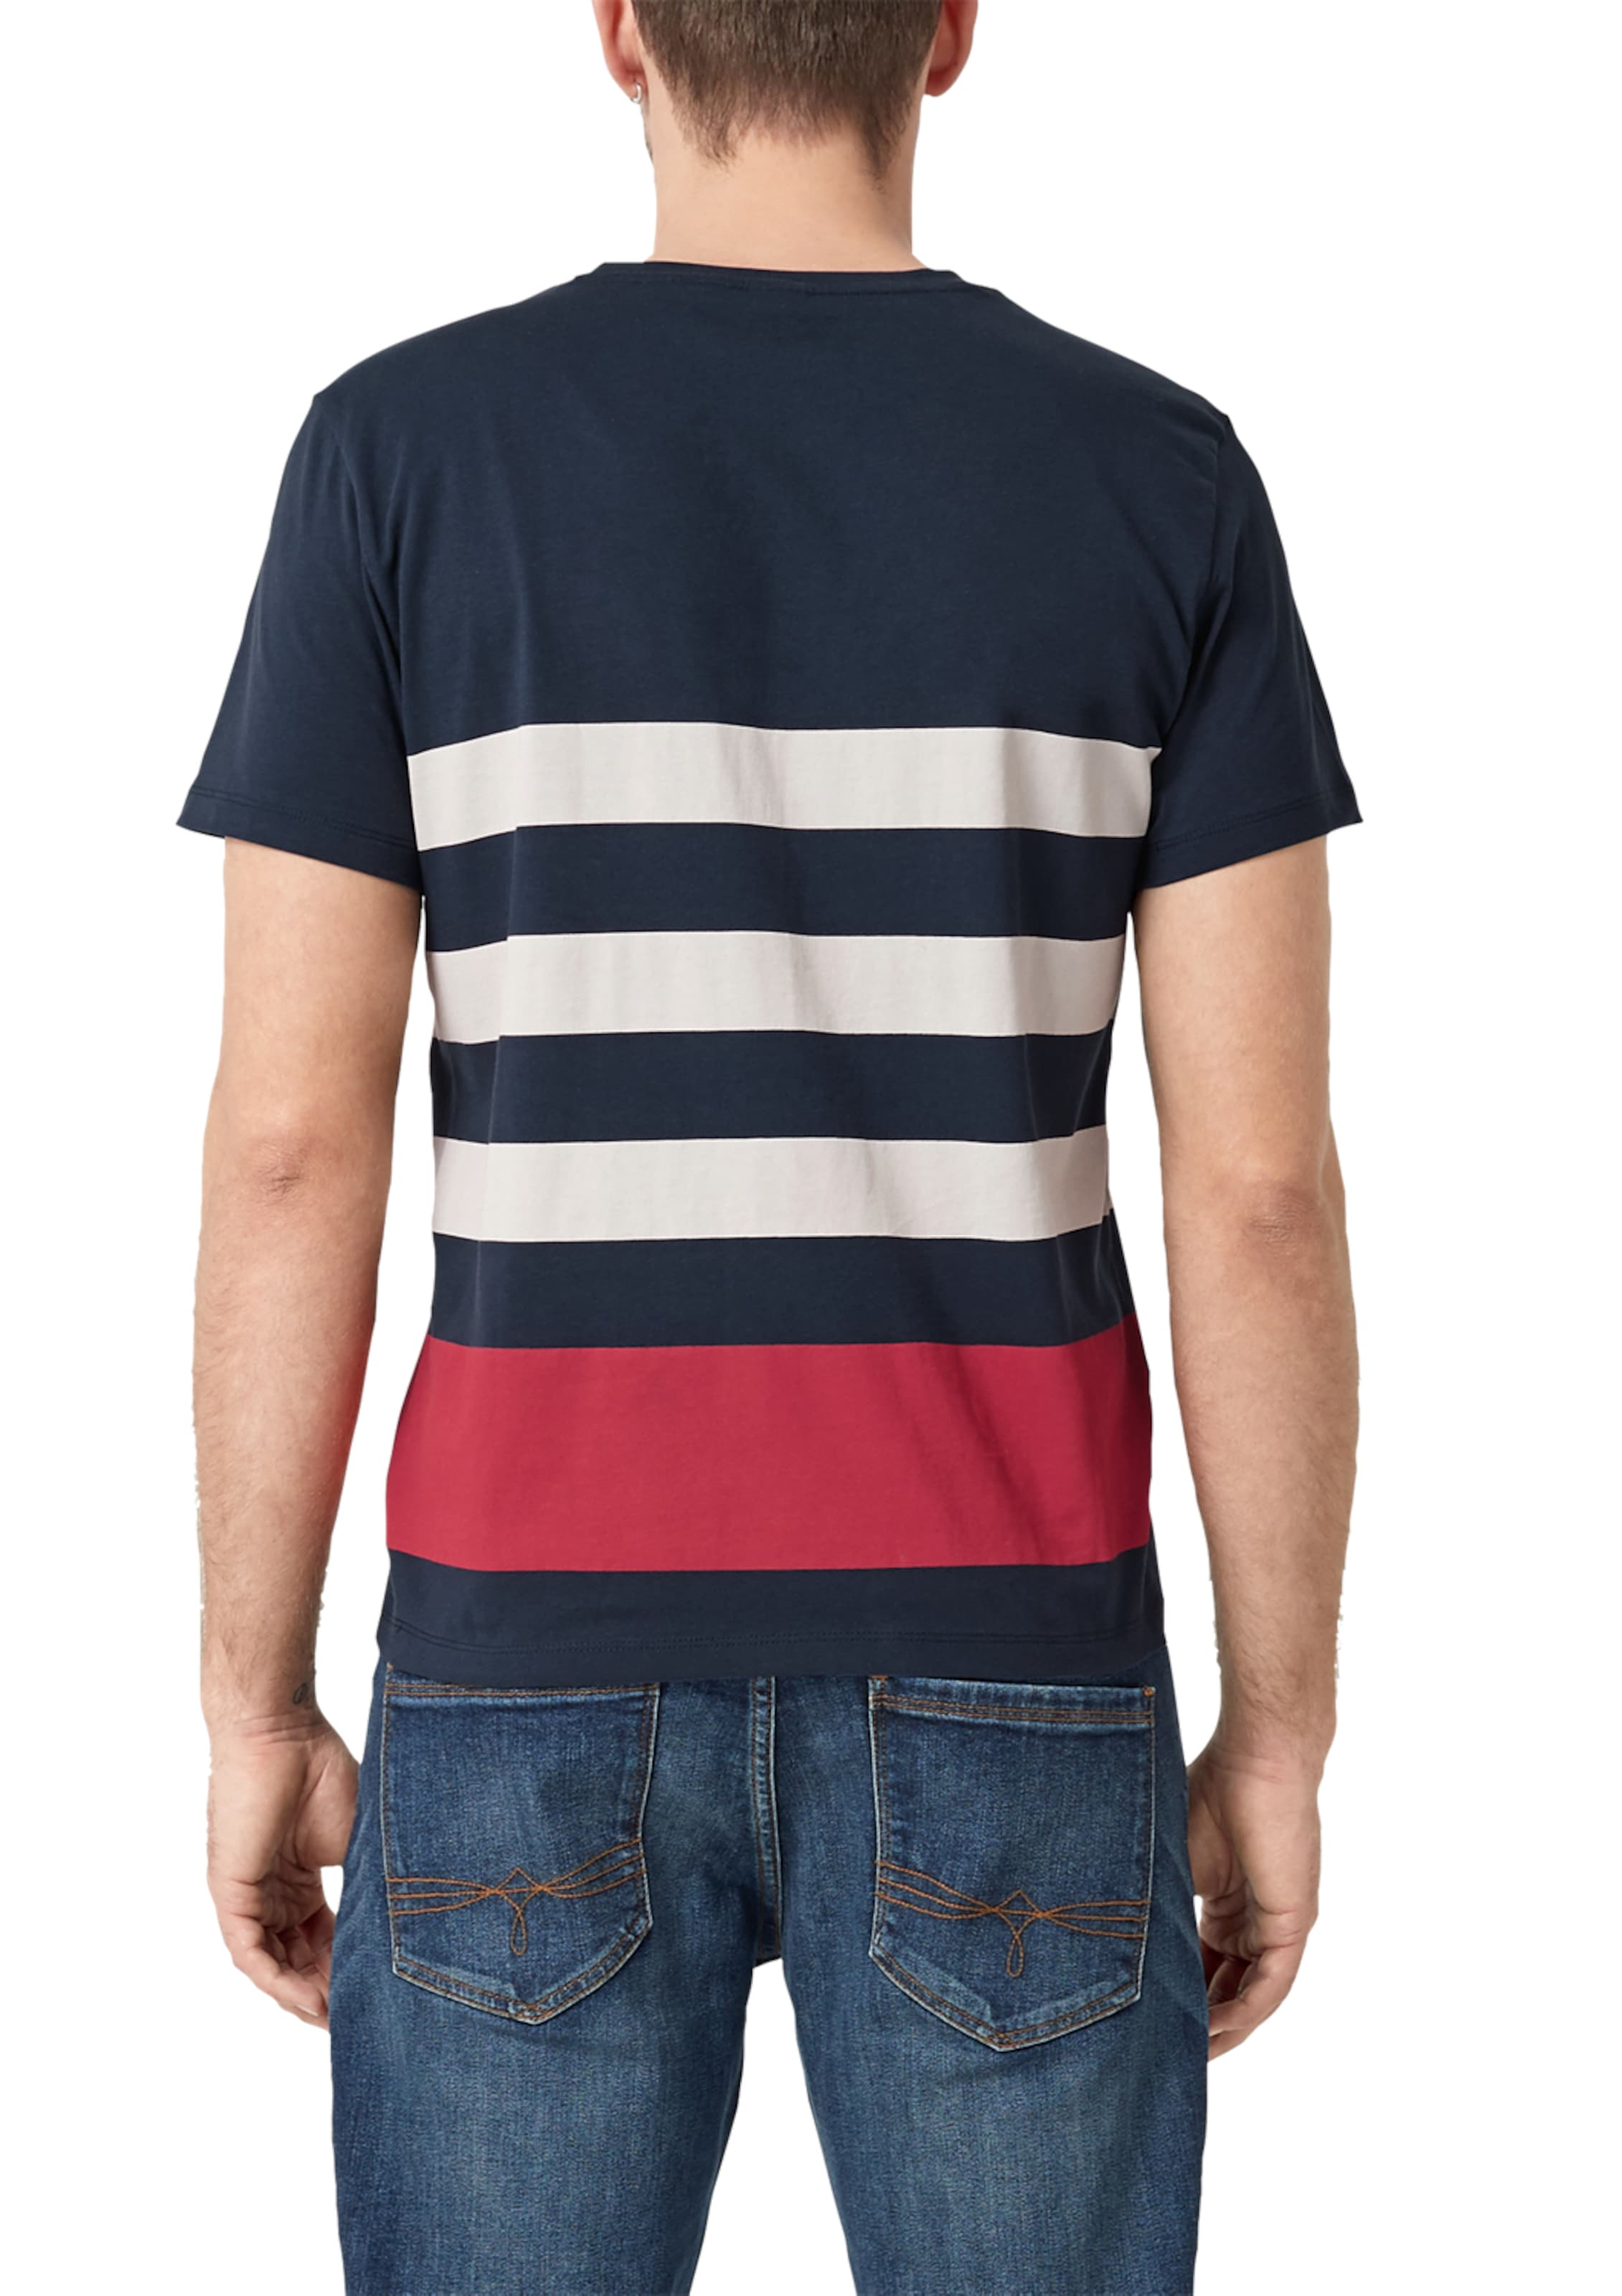 oliver T In S DunkelblauRot shirt Weiß 8PkwOn0